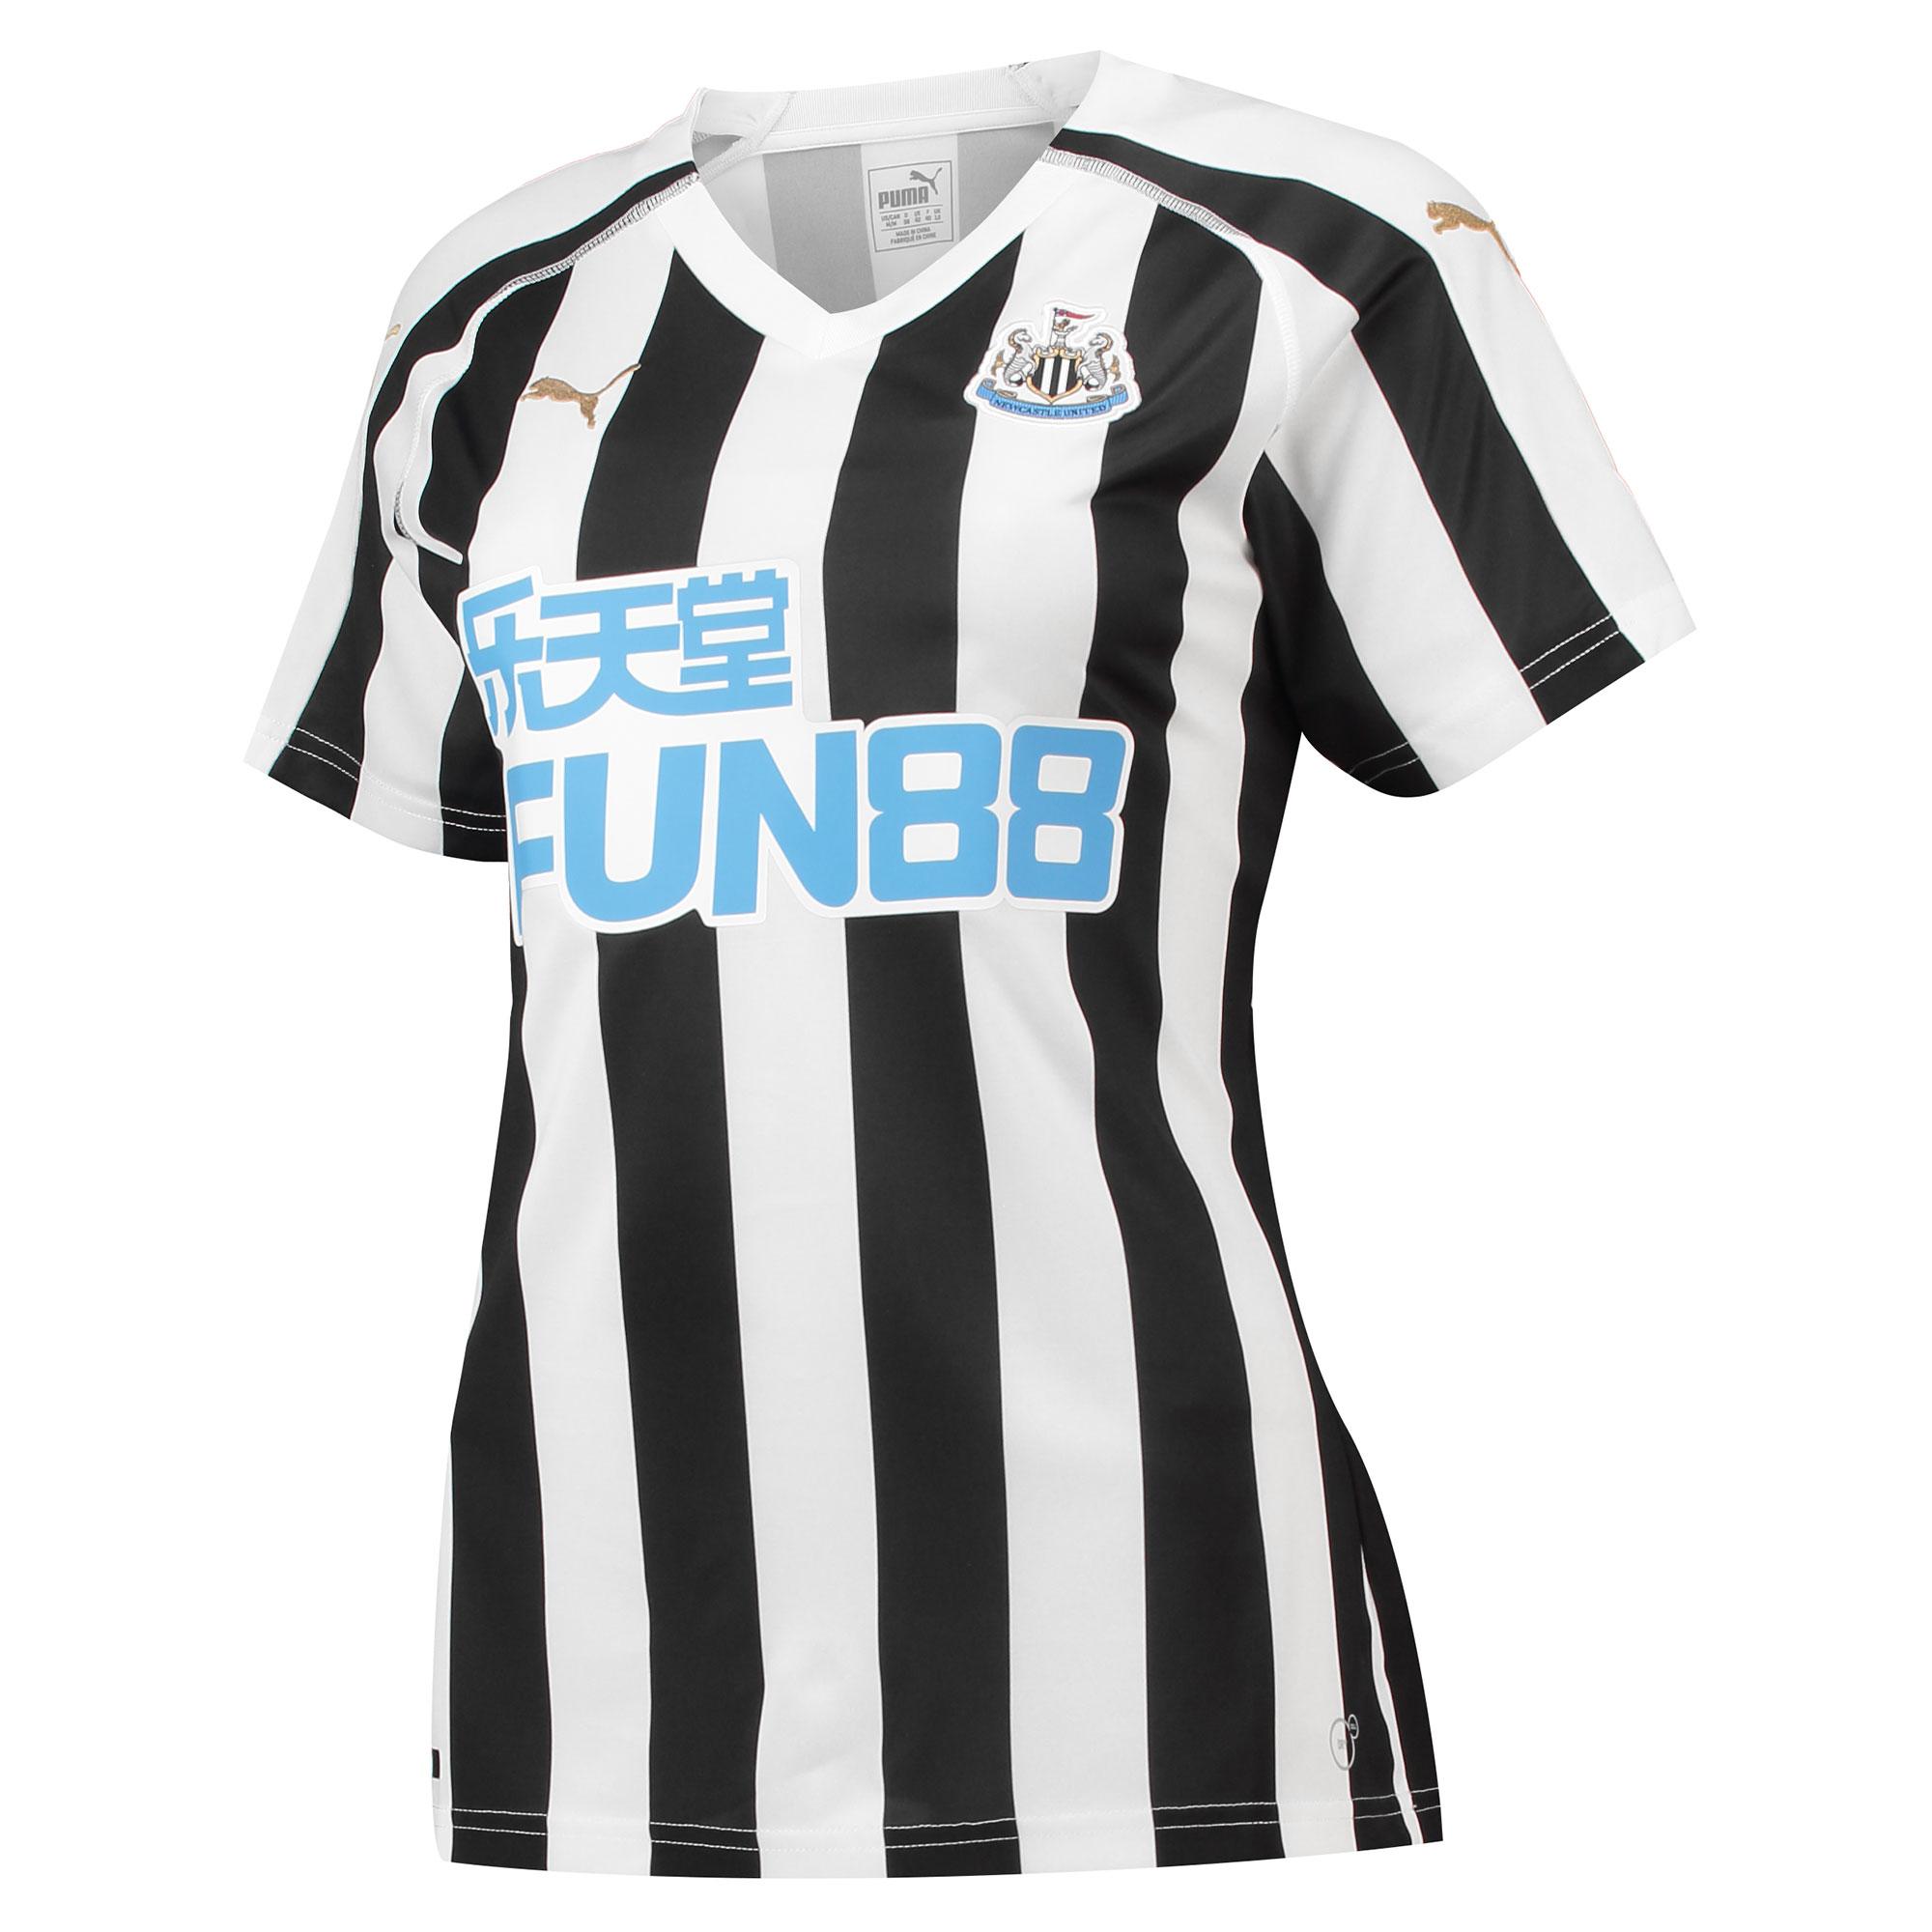 Newcastle United Home Shirt 2018-19 - Womens